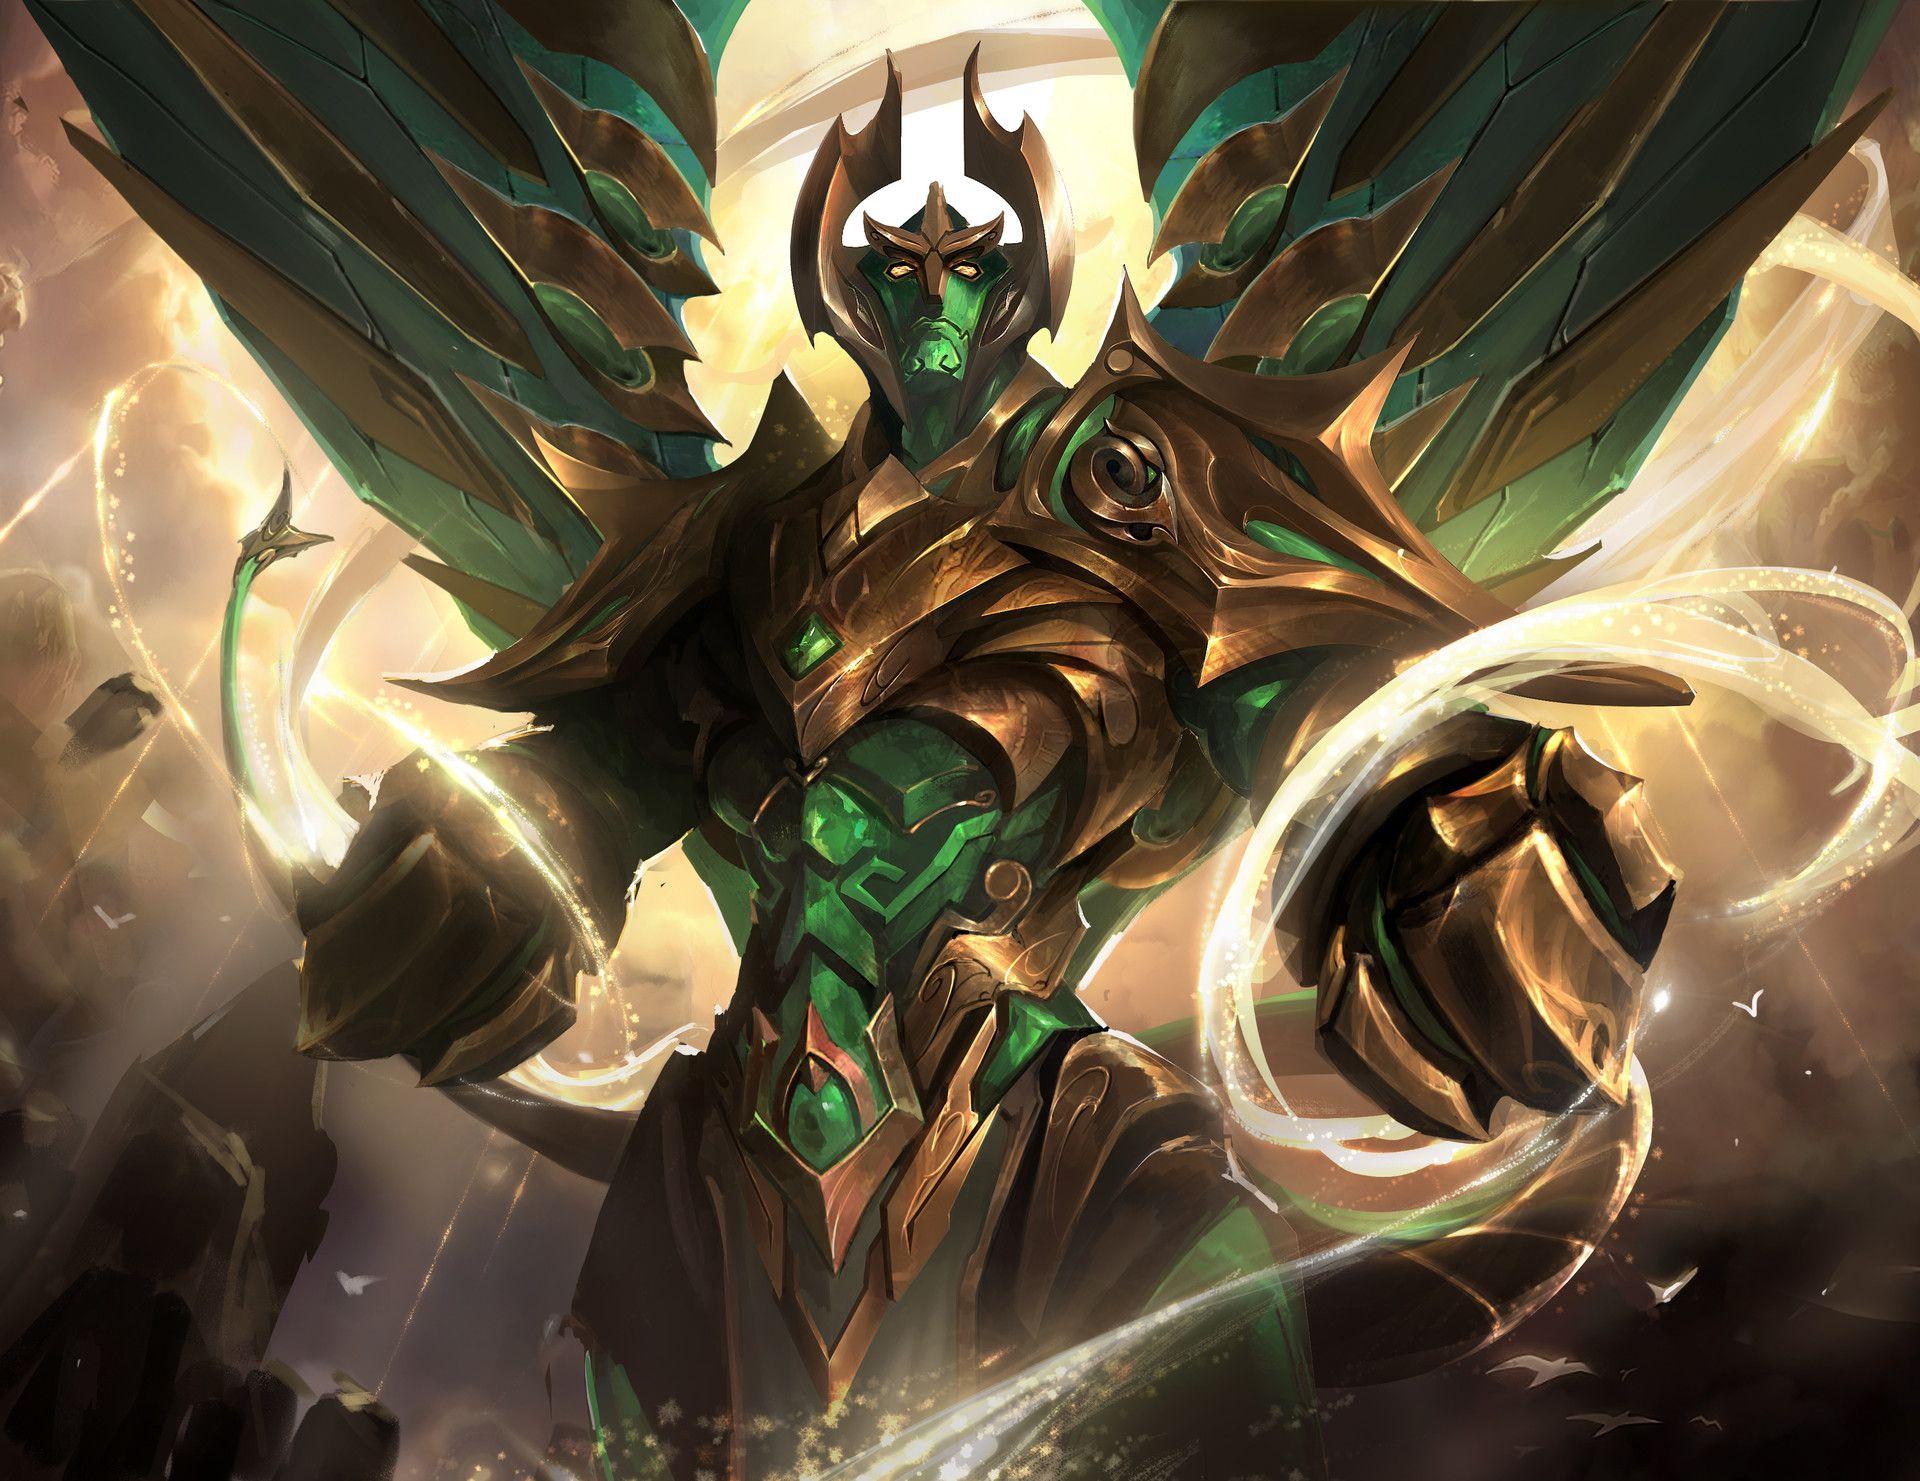 Artstation Galio Dante Liu Dark Fantasy Art Concept Art Characters League Of Legends Game